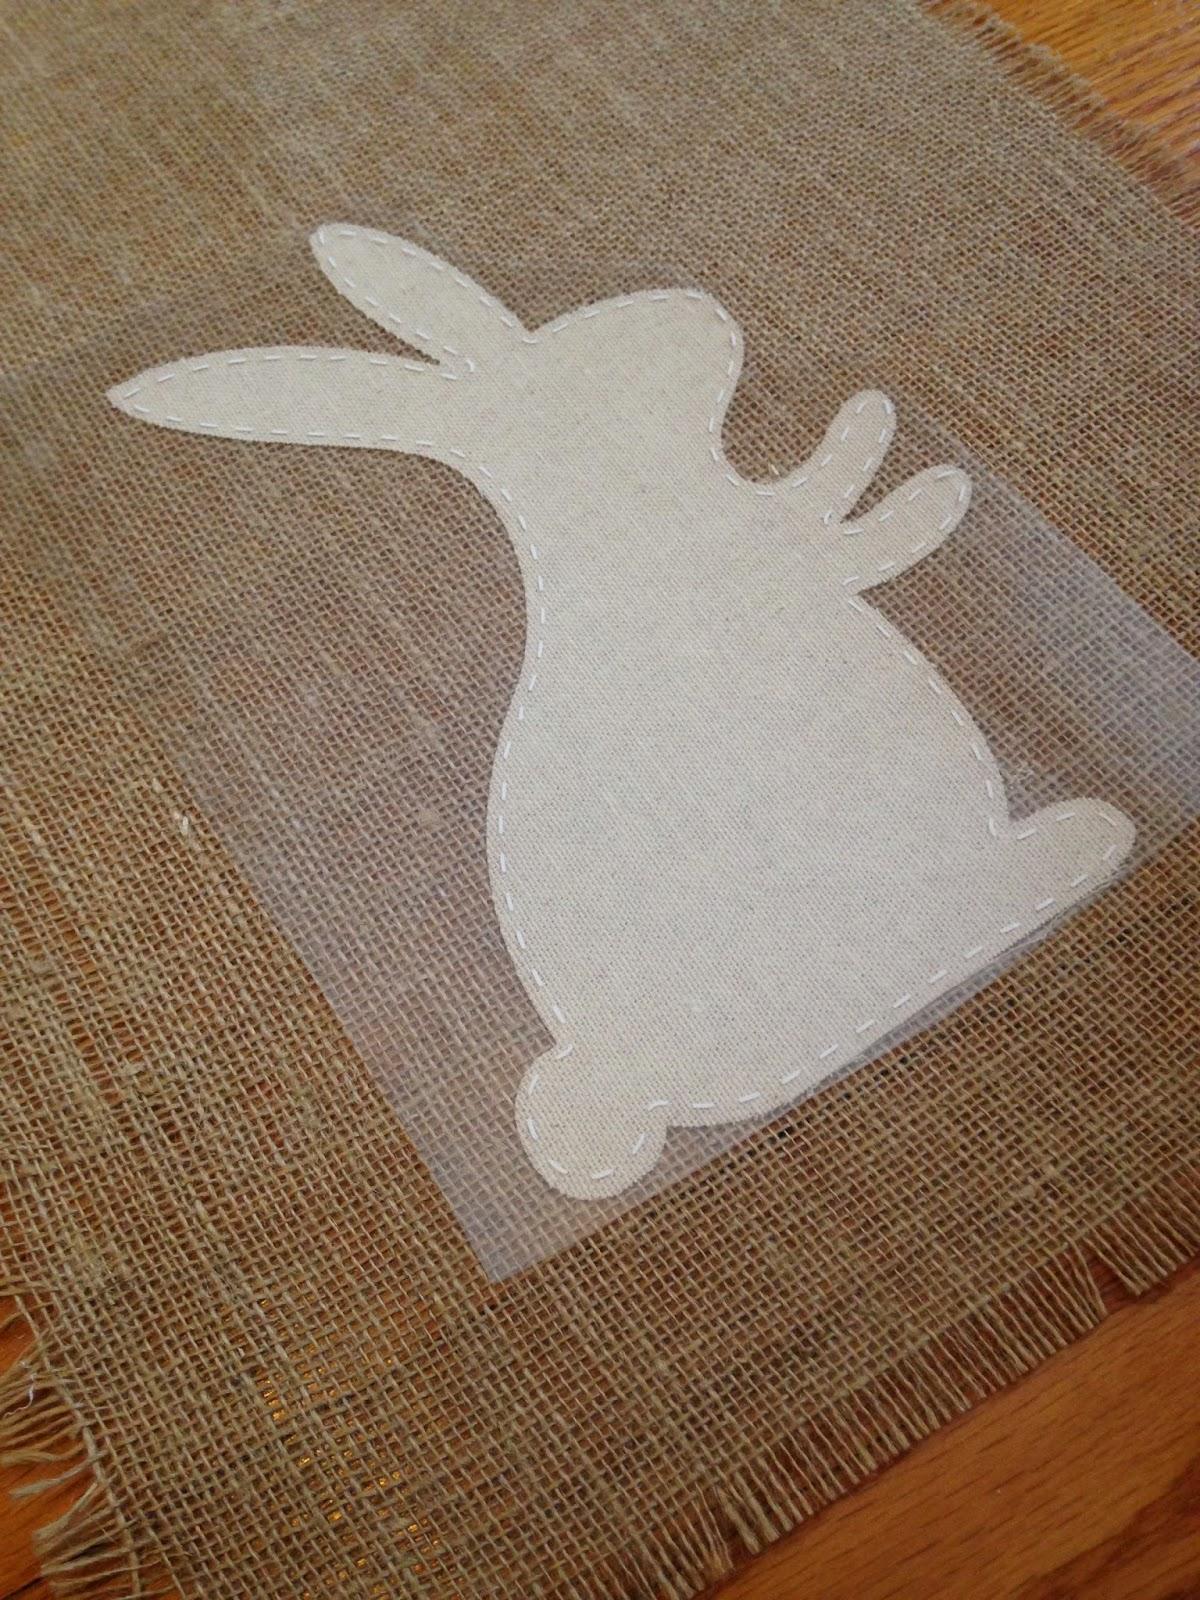 Silhouette project, Silhouette idea, easter bunny, table runner, HTV, heat transfer vinyl